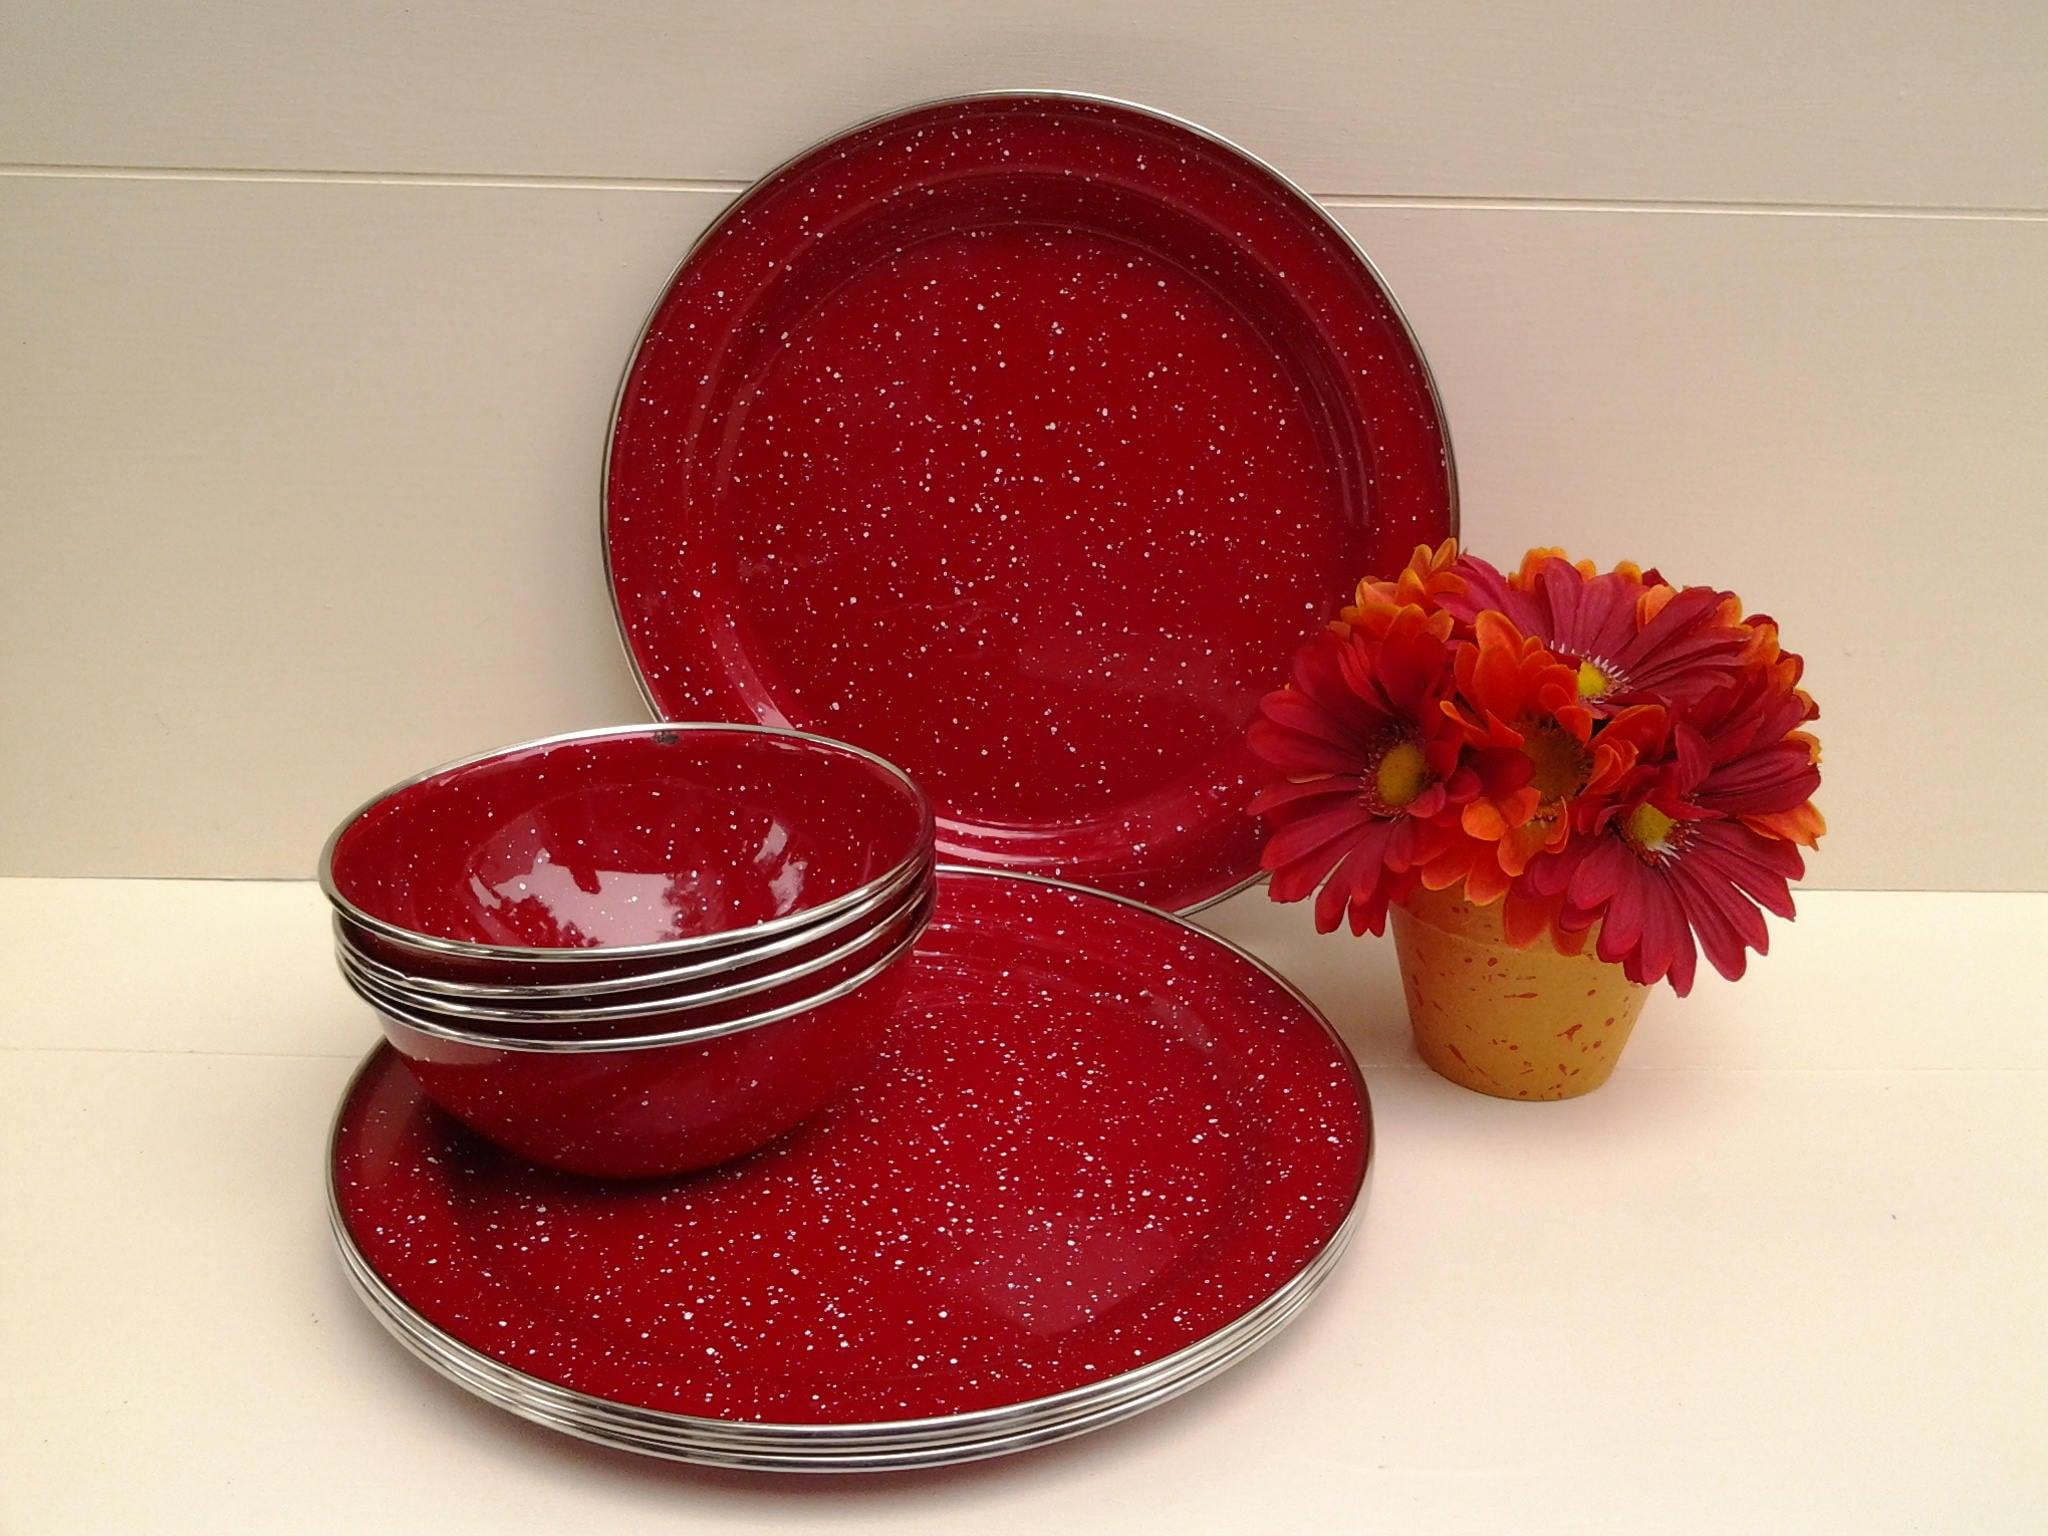 Description Vintage Red And White Enamelware Dish Set